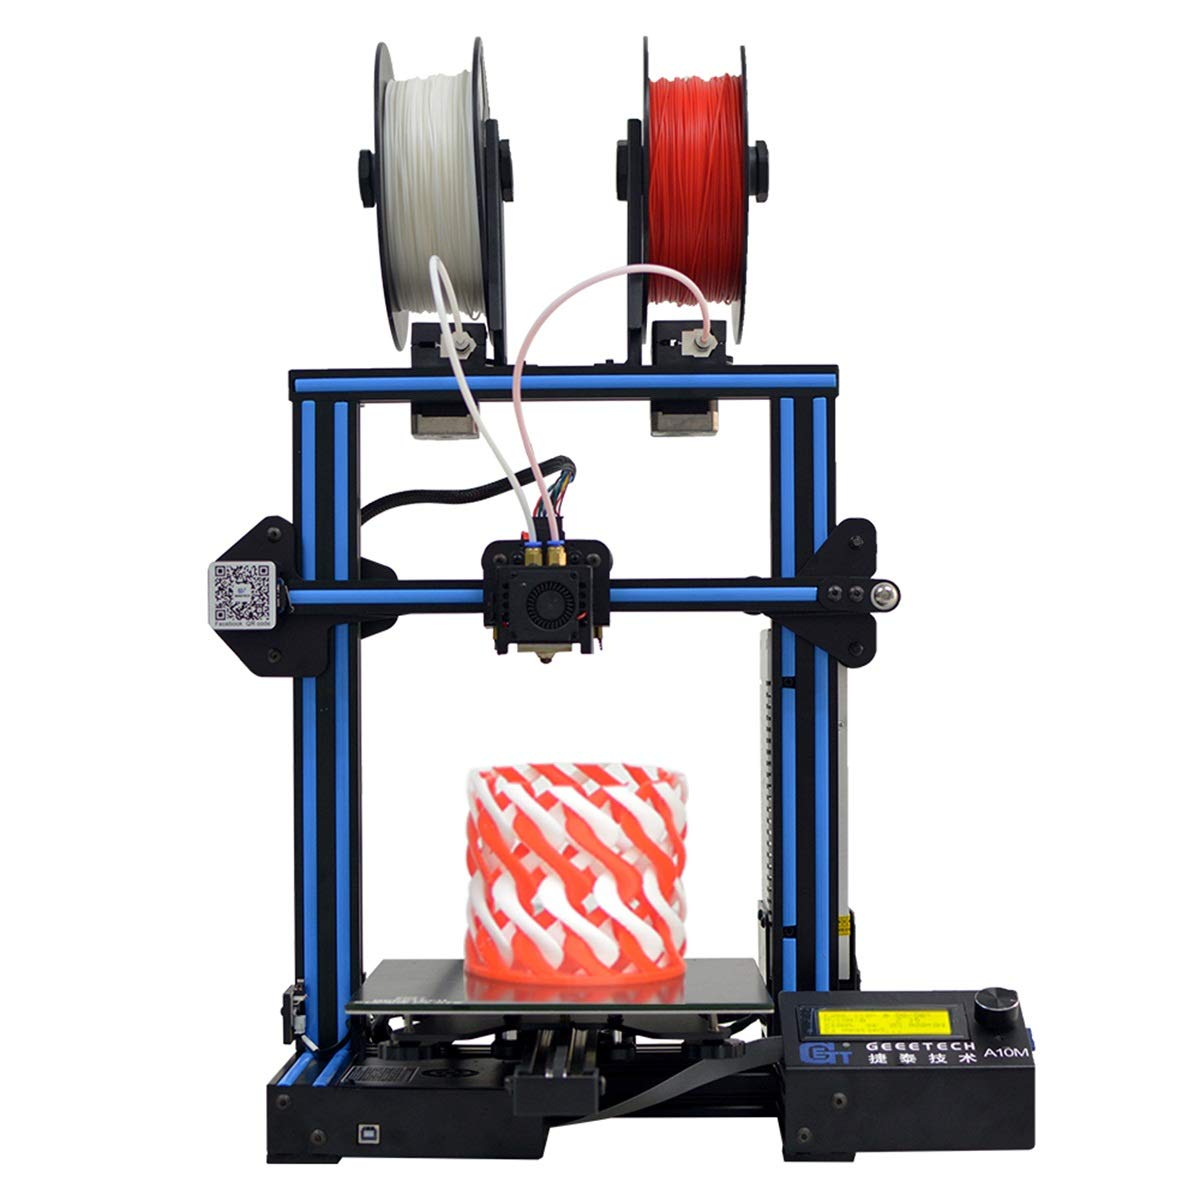 GEEETECH A10M 3D-Drucker mit Mix-Color-Druck, Dual-Extruder-Design, Filament-Detektor und Break-Resuming-Funktion, Prusa I3 schnell-Montage DIY-Kit.